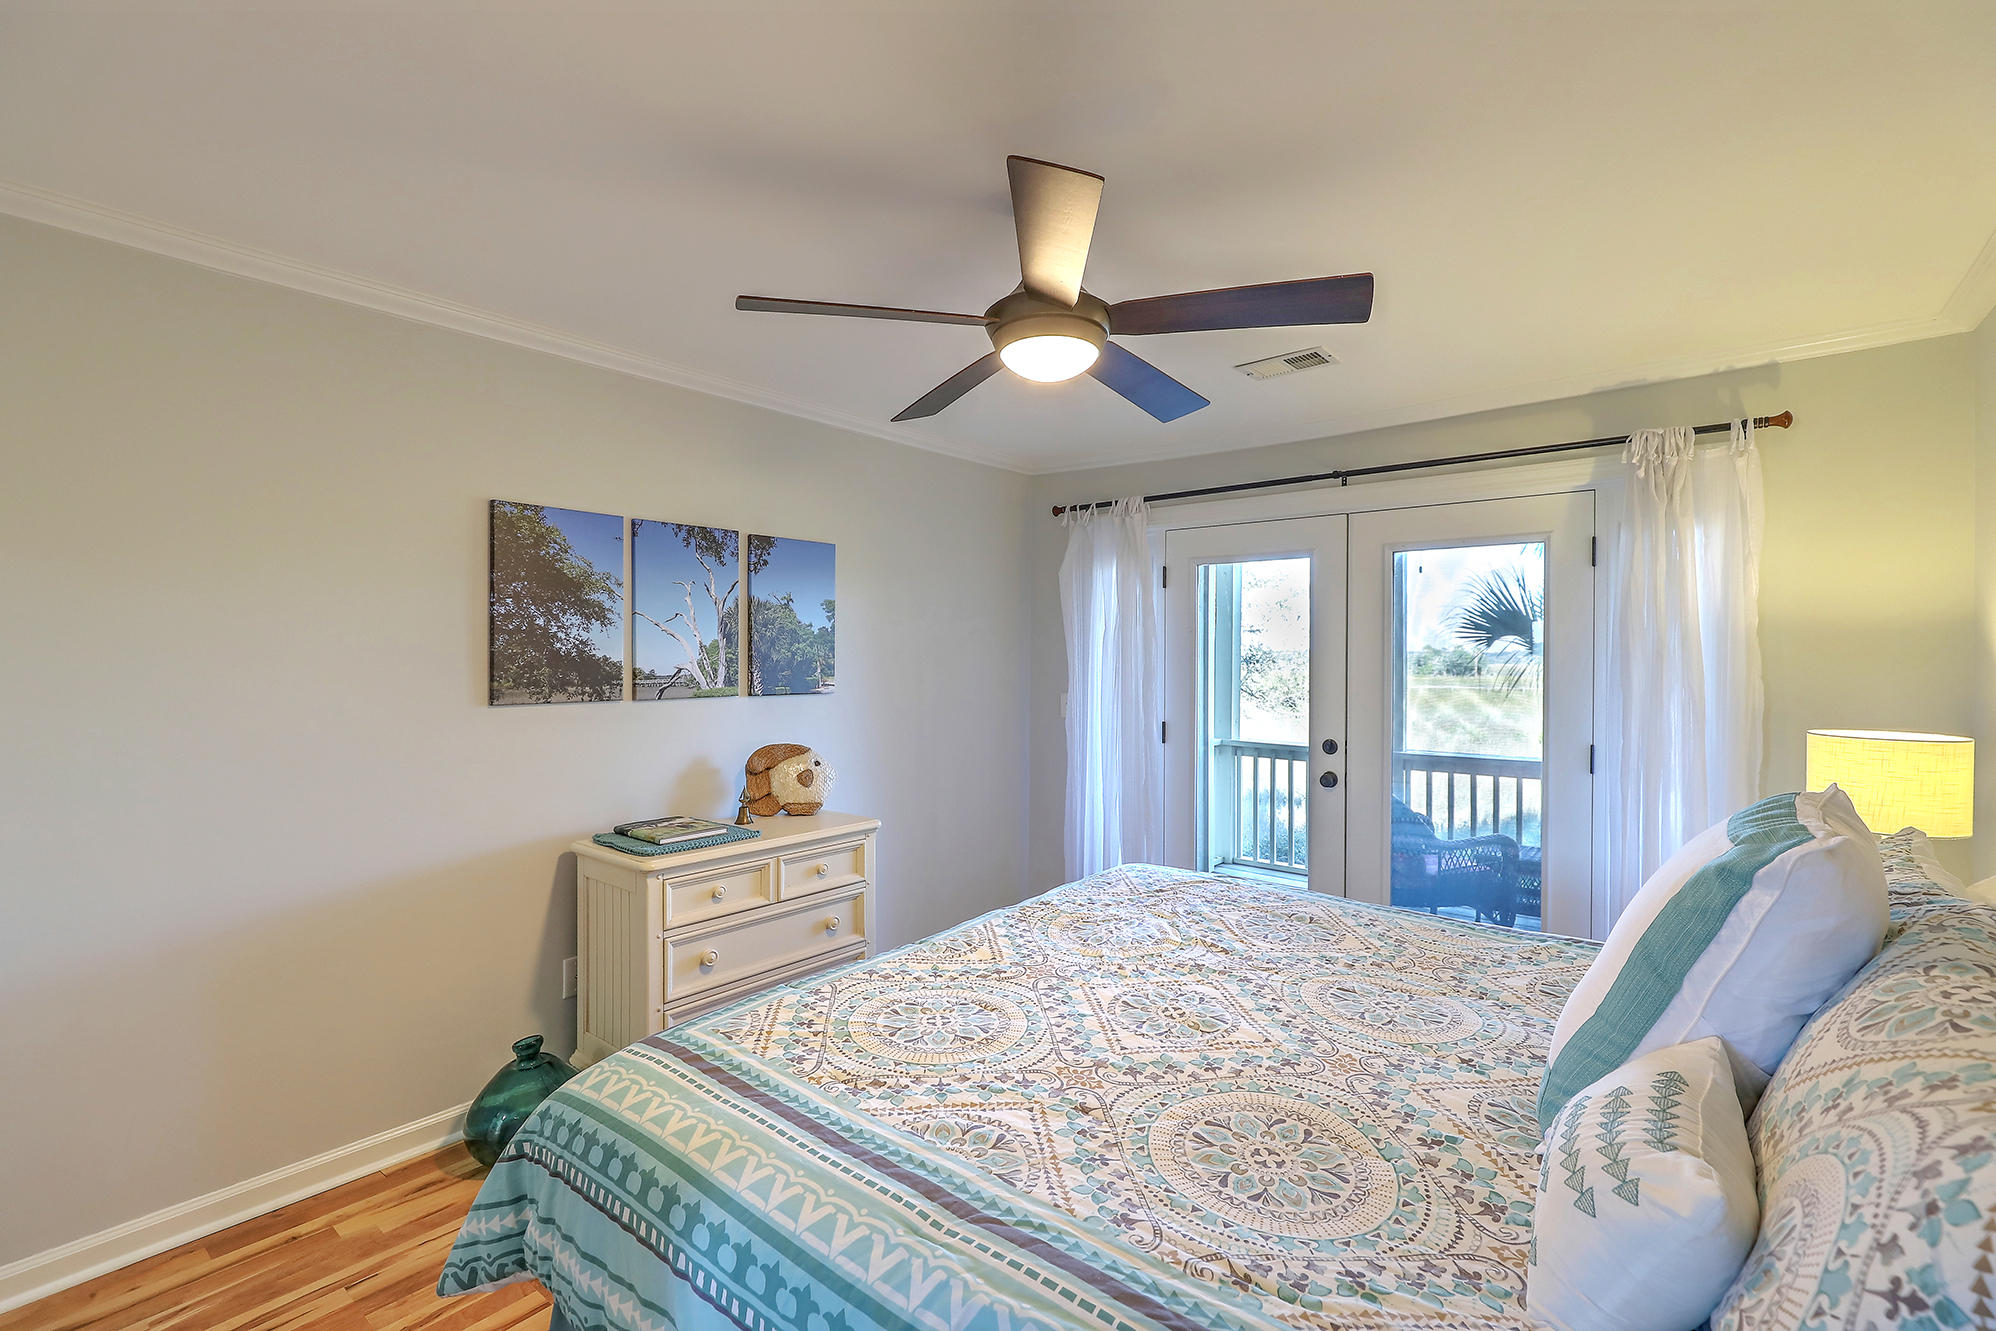 Seabrook Island Homes For Sale - 2103 Landfall, Johns Island, SC - 11